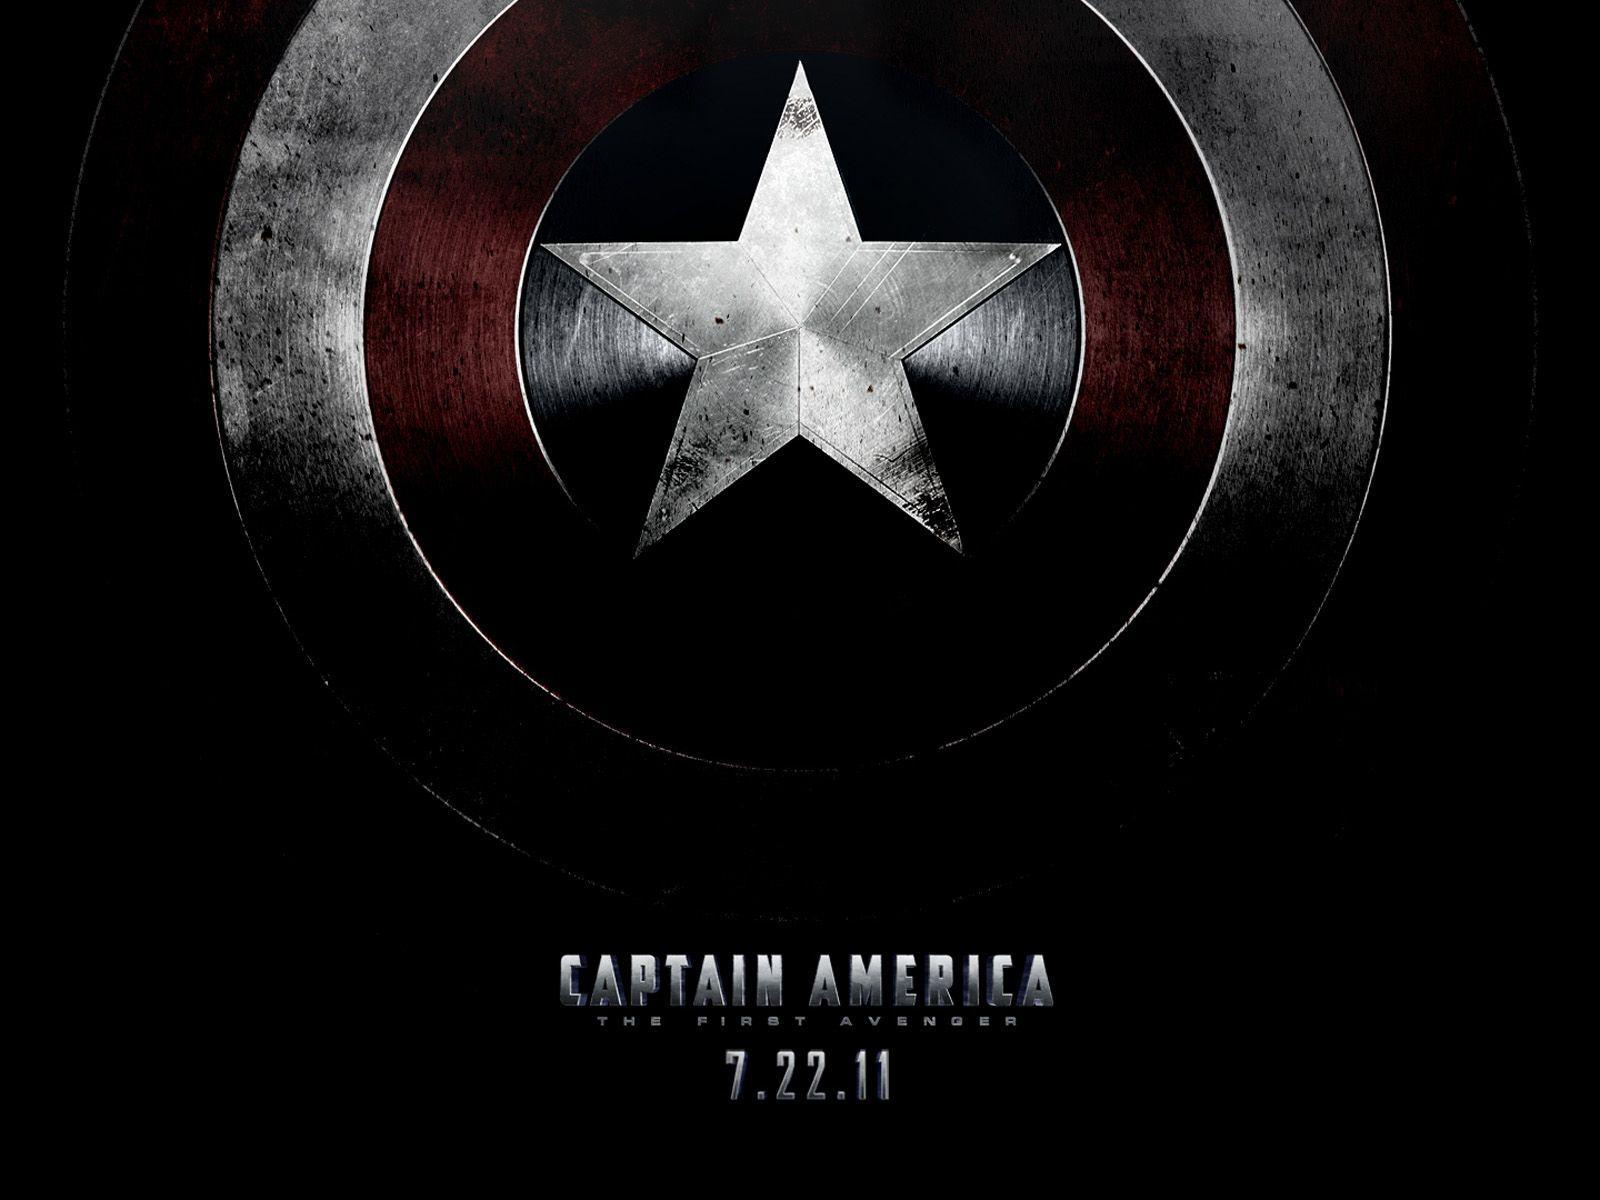 captain america logo Wallpapers - Free captain america logo ...